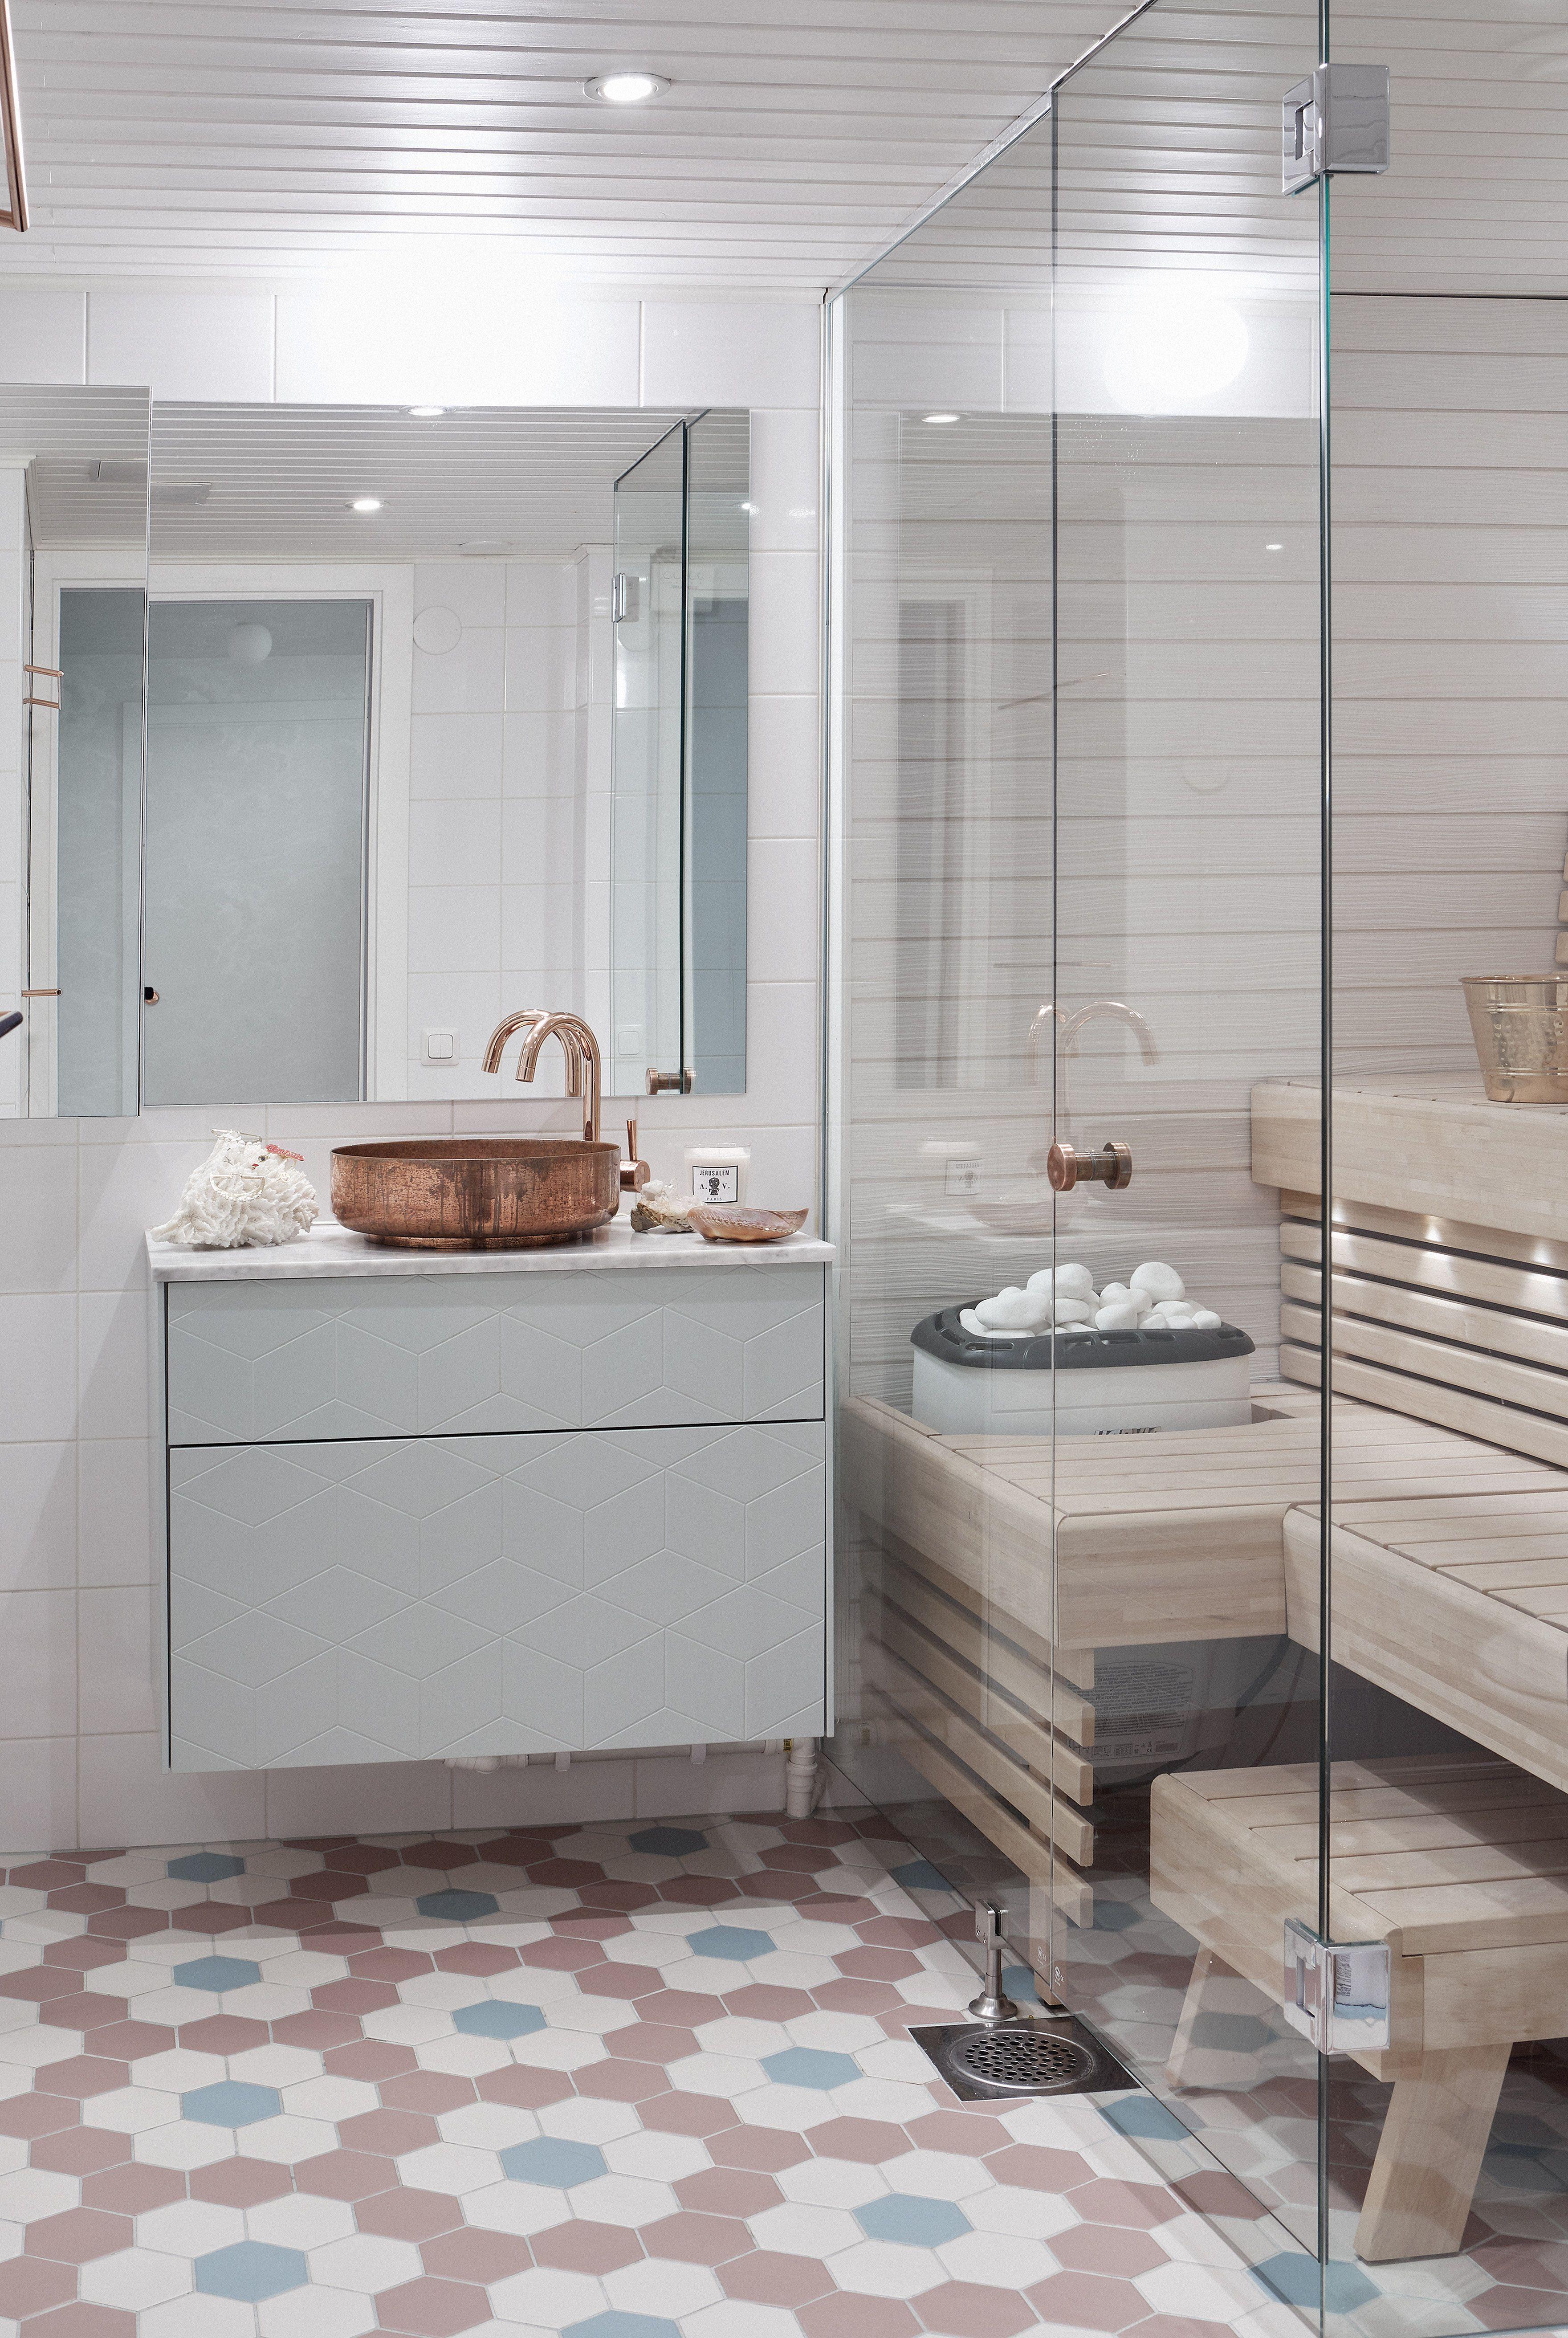 Bathroom Tile Ideas India Luxurybathroomtilesindia Bathrooms And